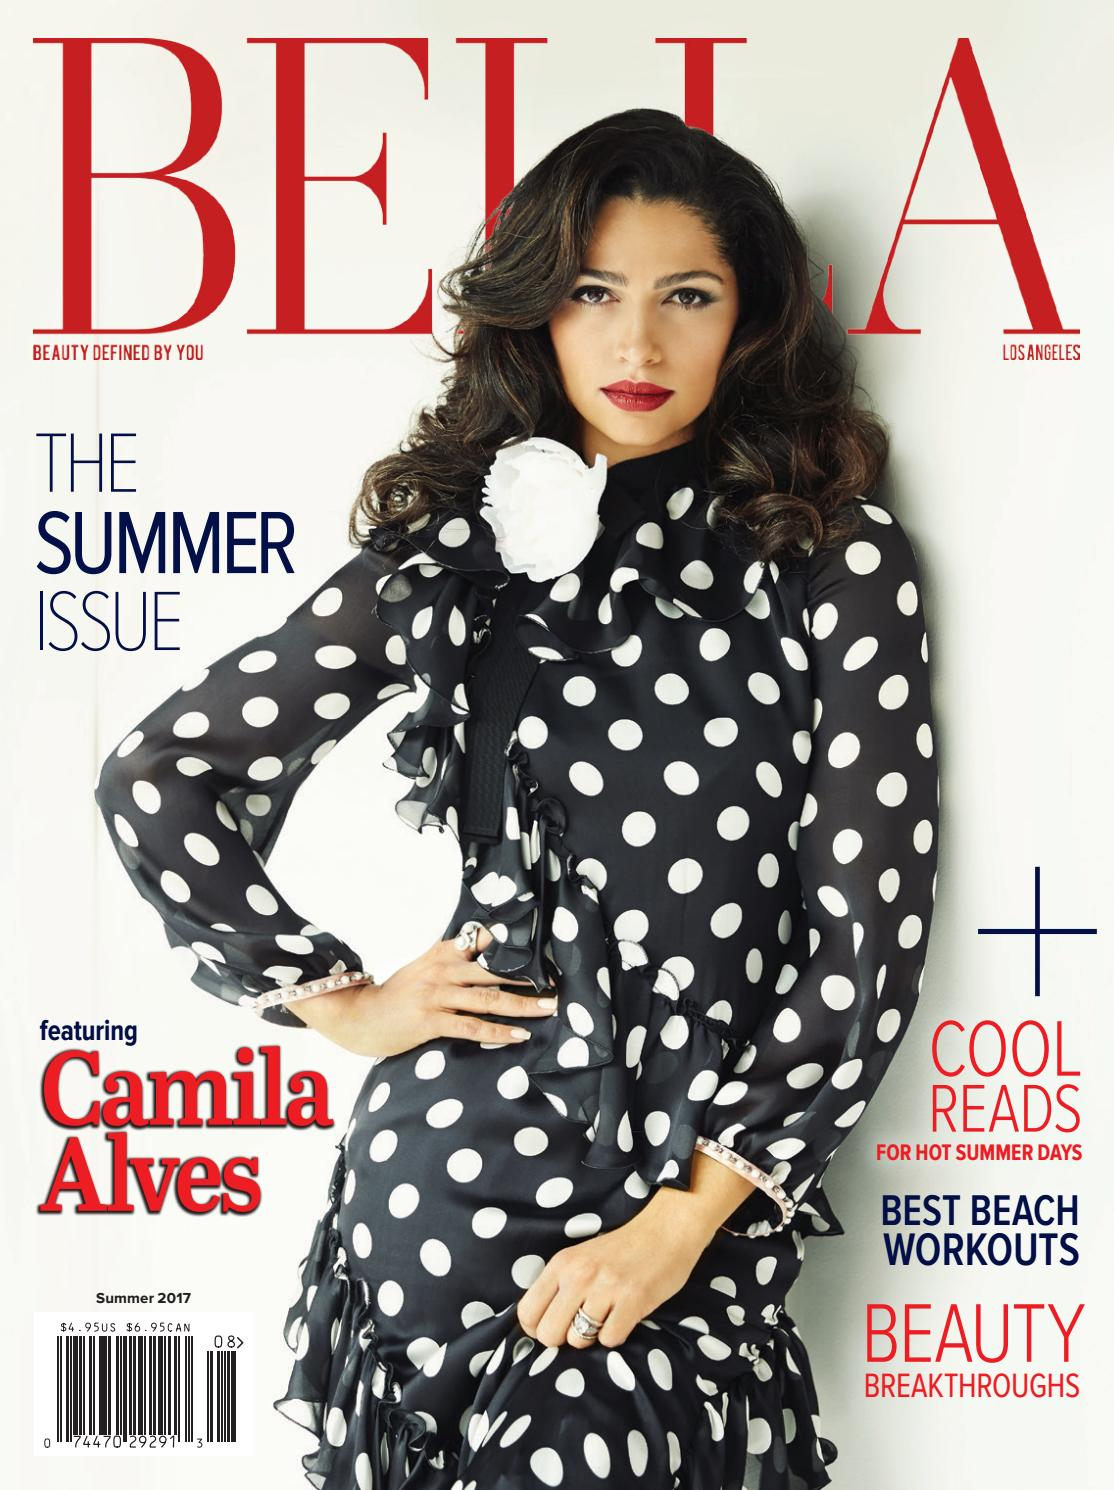 47ad0d6748fc BELLA Los Angeles-Summer 2017 by BELLA Media Group - issuu